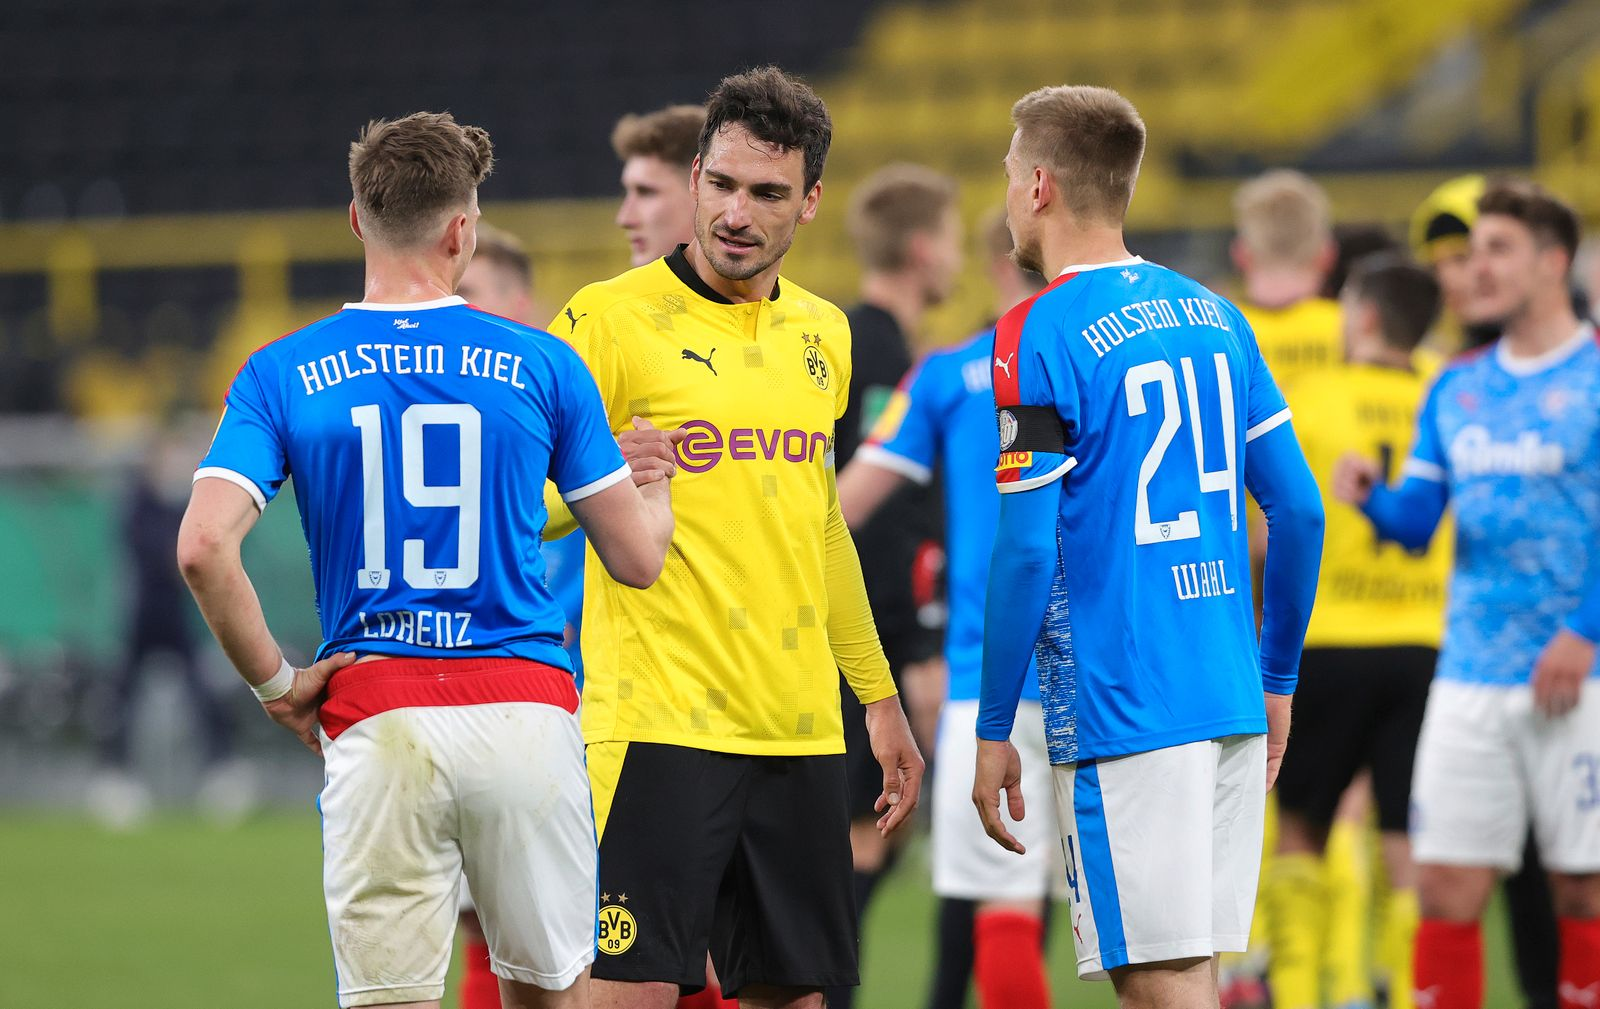 firo : 01.05.2021, Fußball: Fussball: DFB-Pokal, Halbfinale,Saison 2020/21 BVB , Borussia Dortmund - Holstein Kiel